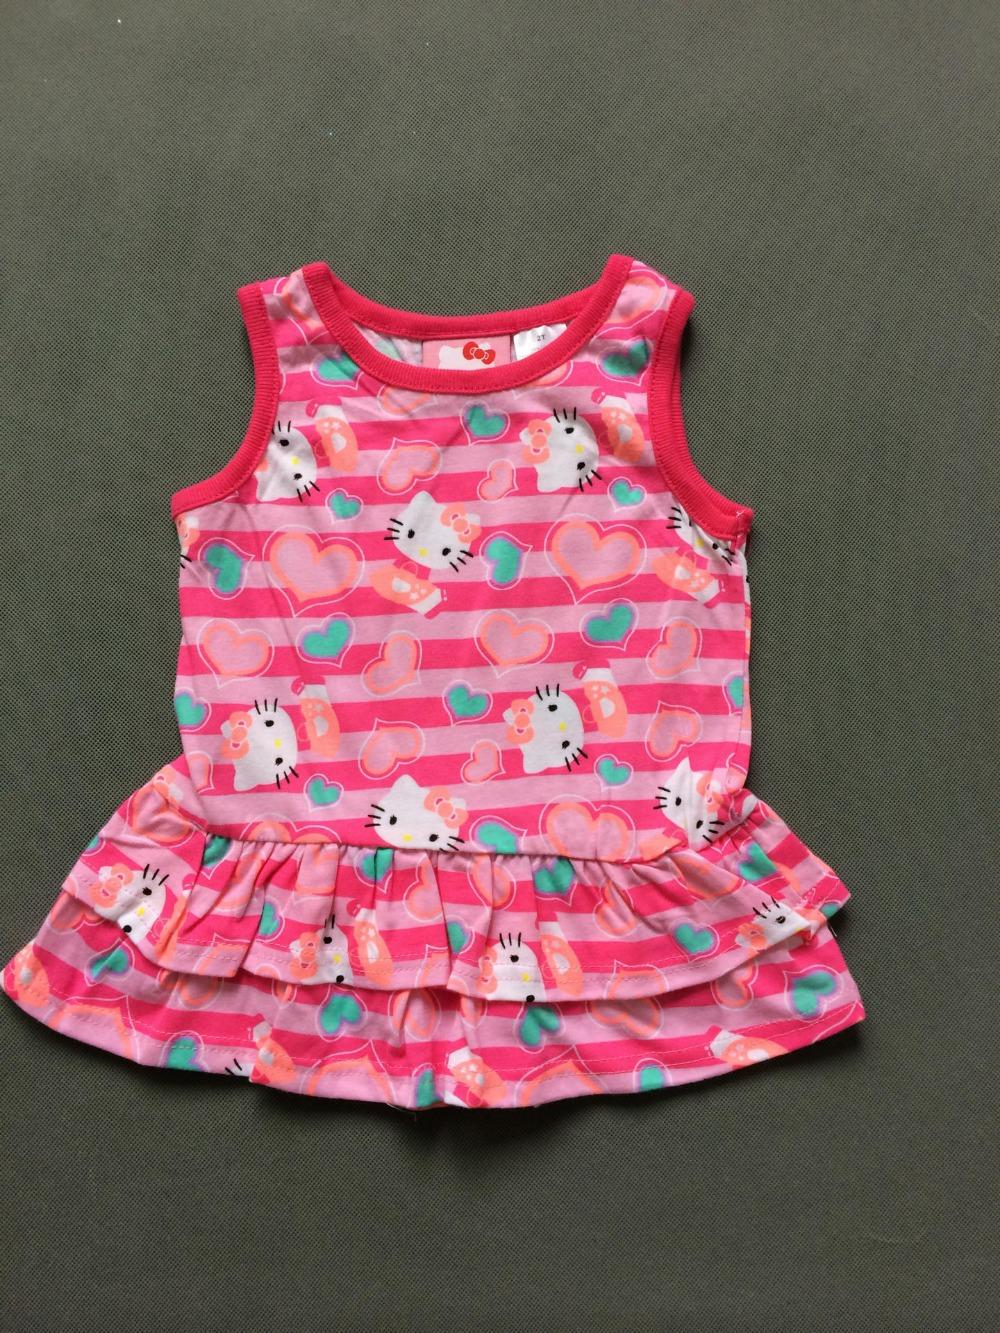 (5 Pcs/Lot) Very Beautiful Colorful Love Heart Hello Kitty 1~4 Years Children Girl's Sleeveless Dress(China (Mainland))